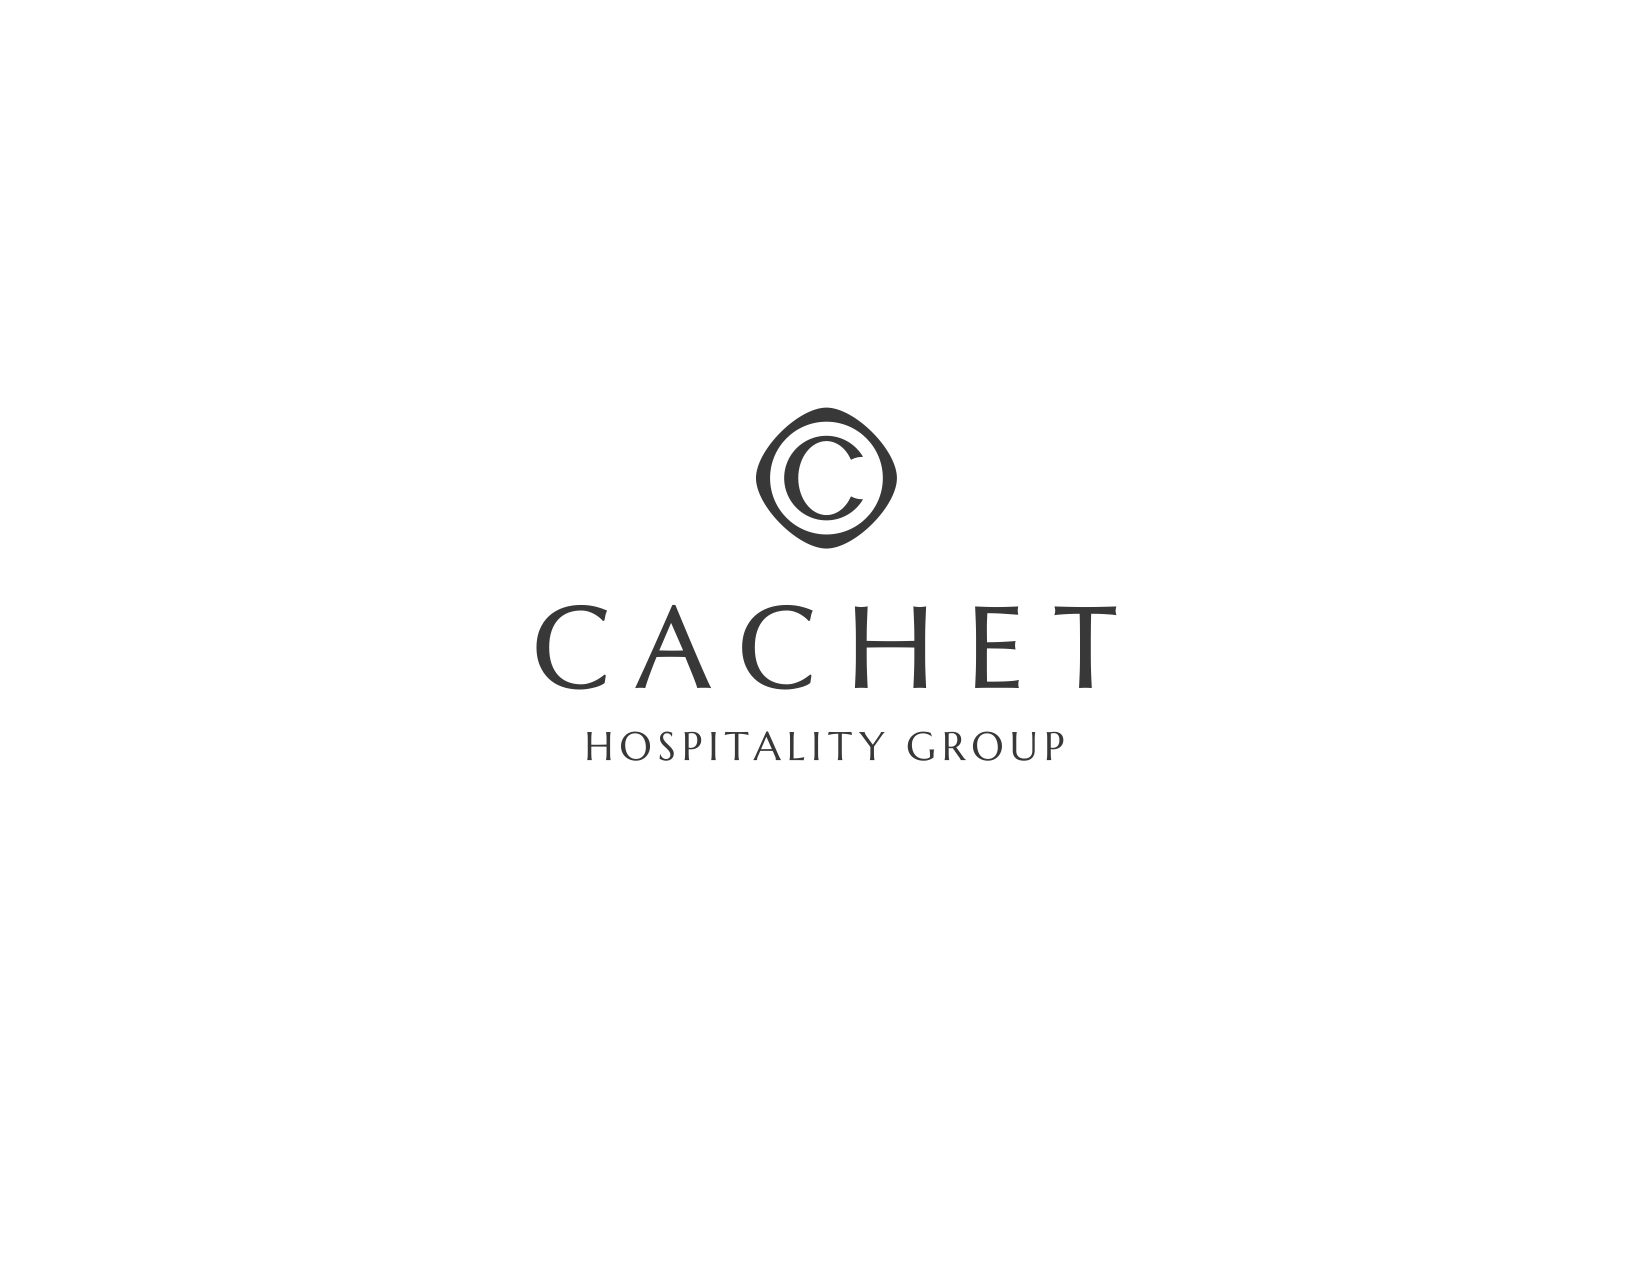 Cachet Hospitality Group